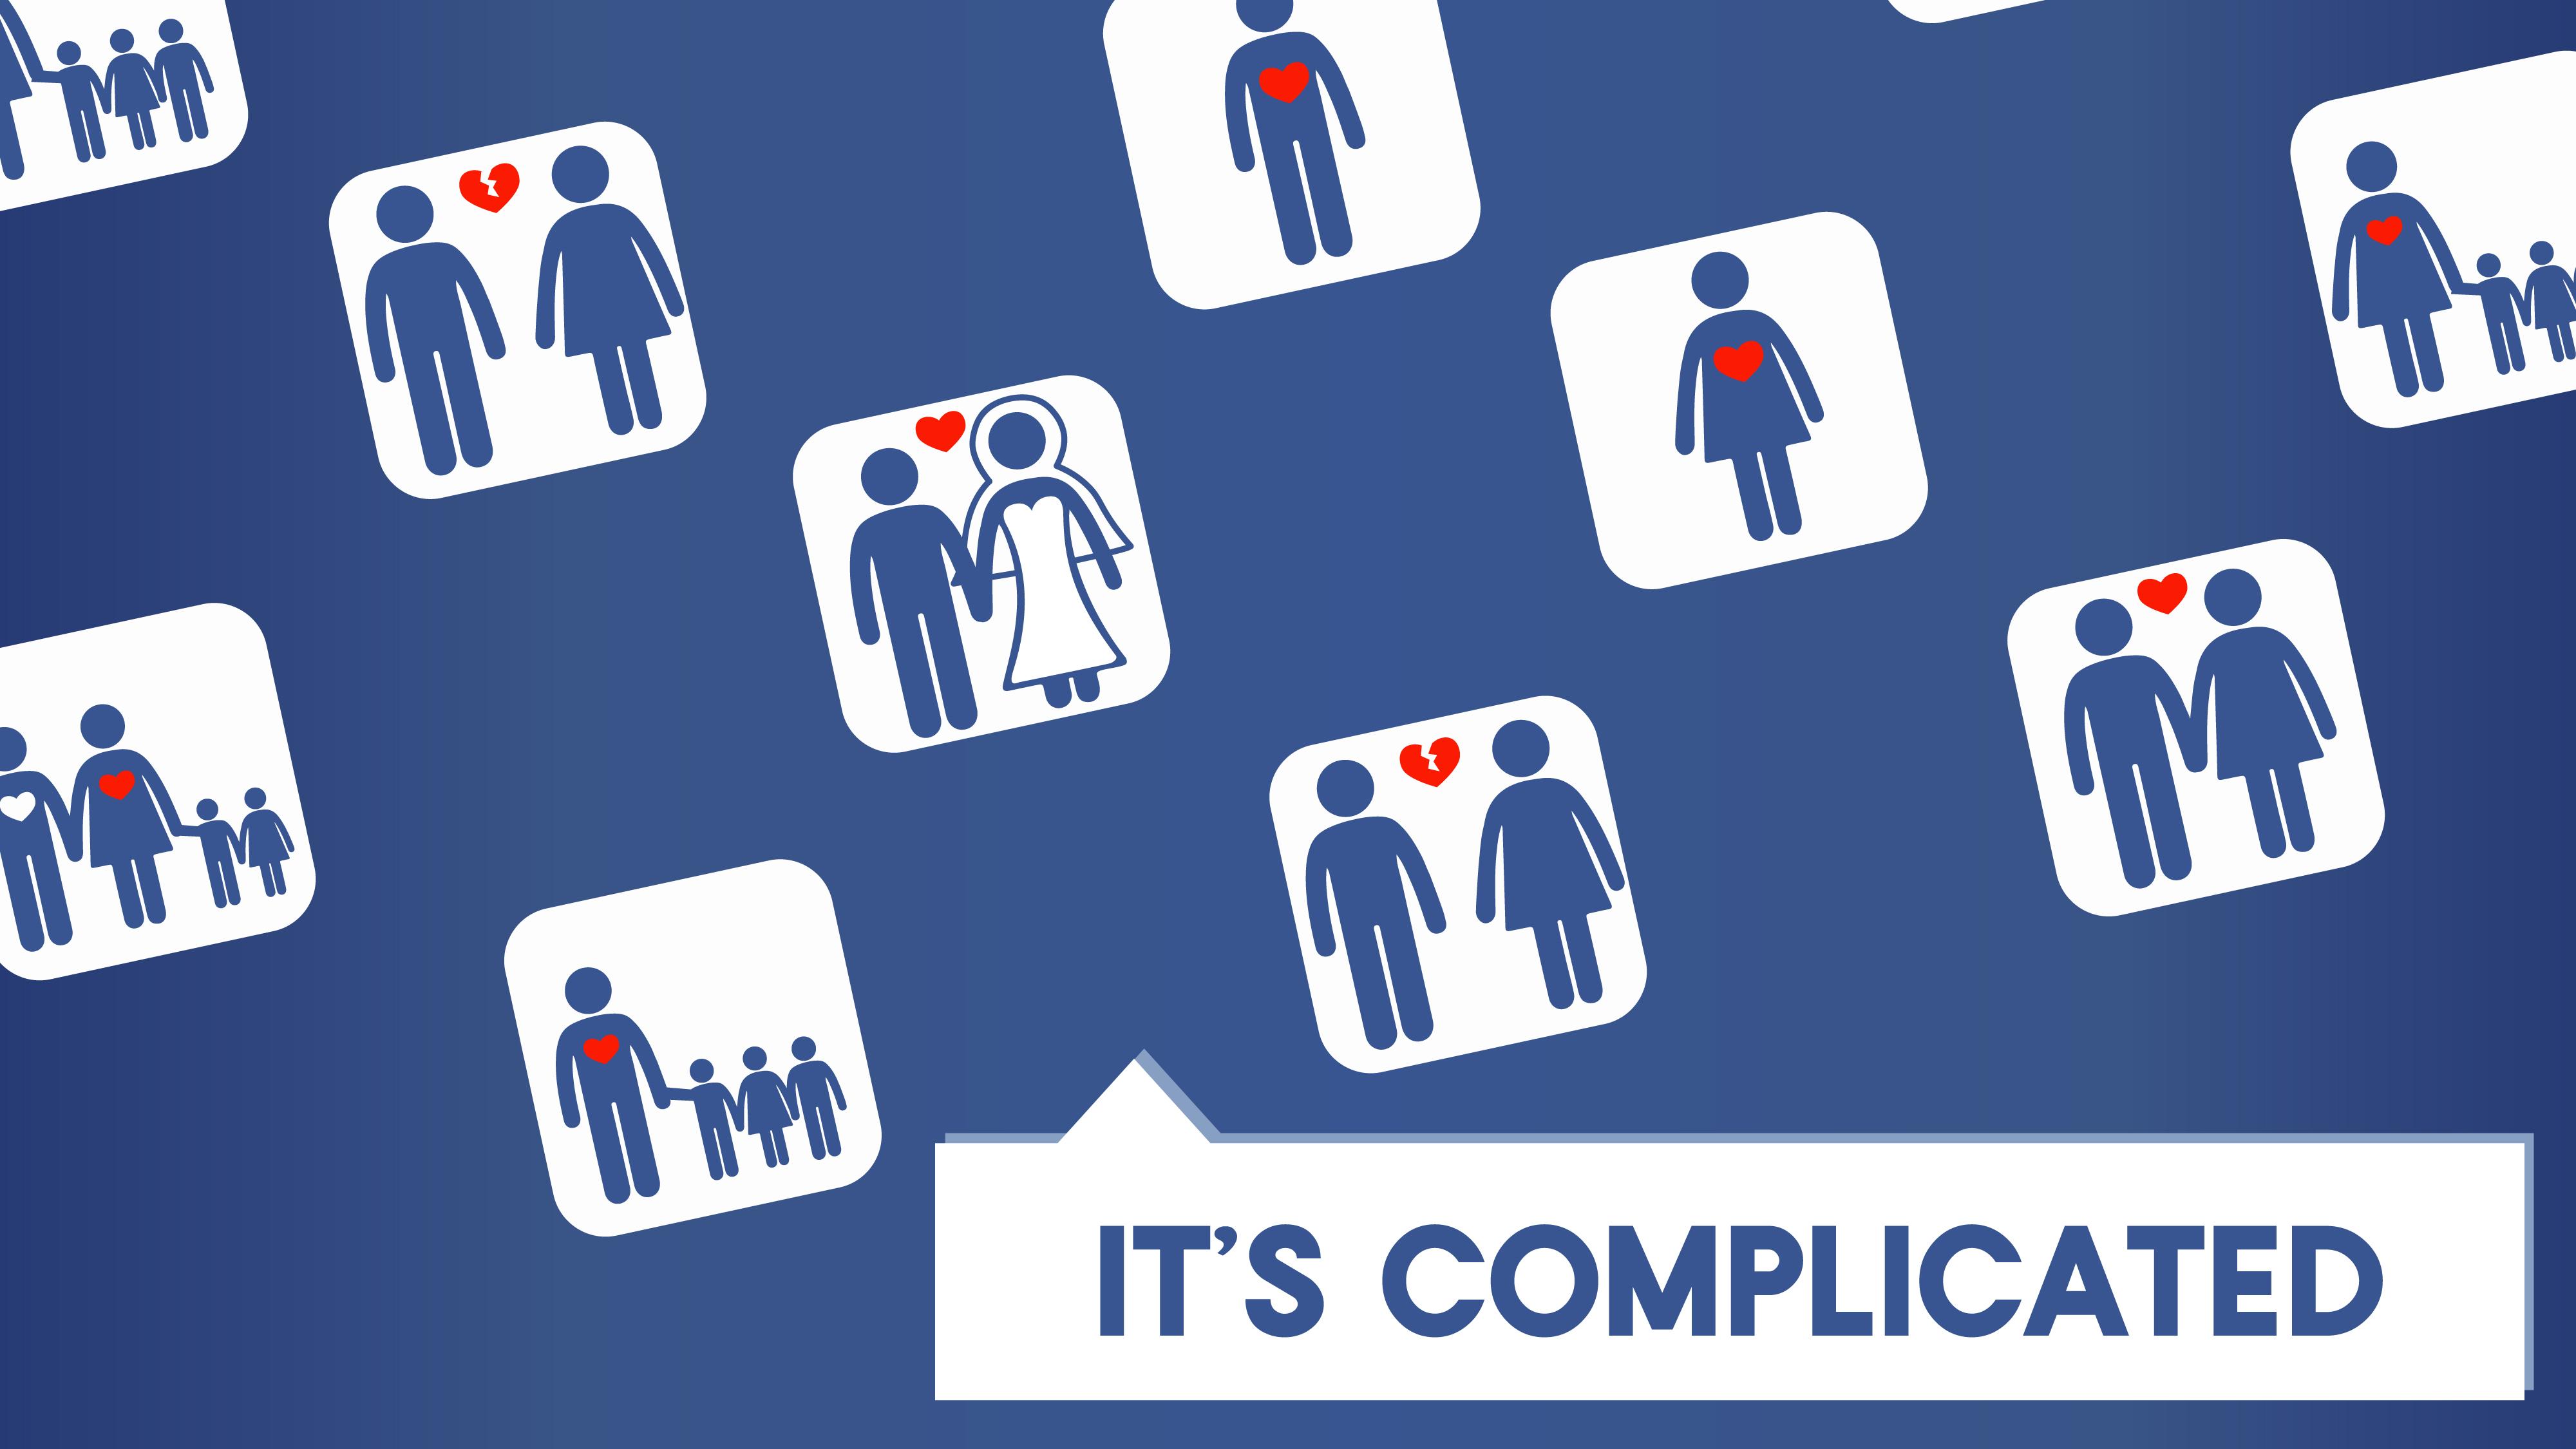 SERM_2012_It's Complicated-01